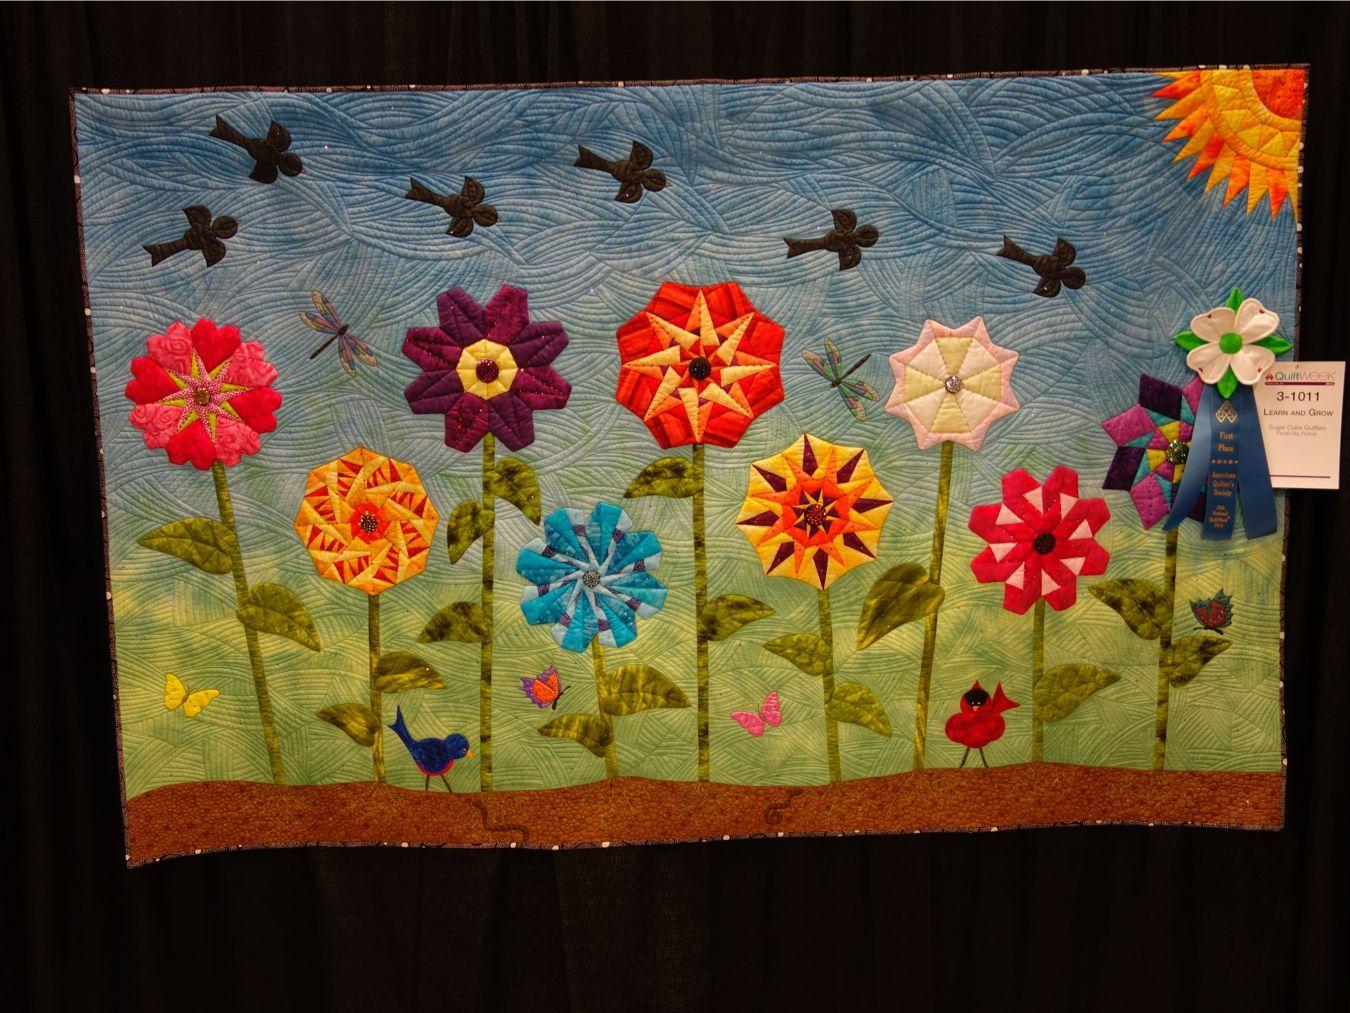 The quilt show - Paducah | Free Motion 2 | Pinterest : quilt show chicago - Adamdwight.com